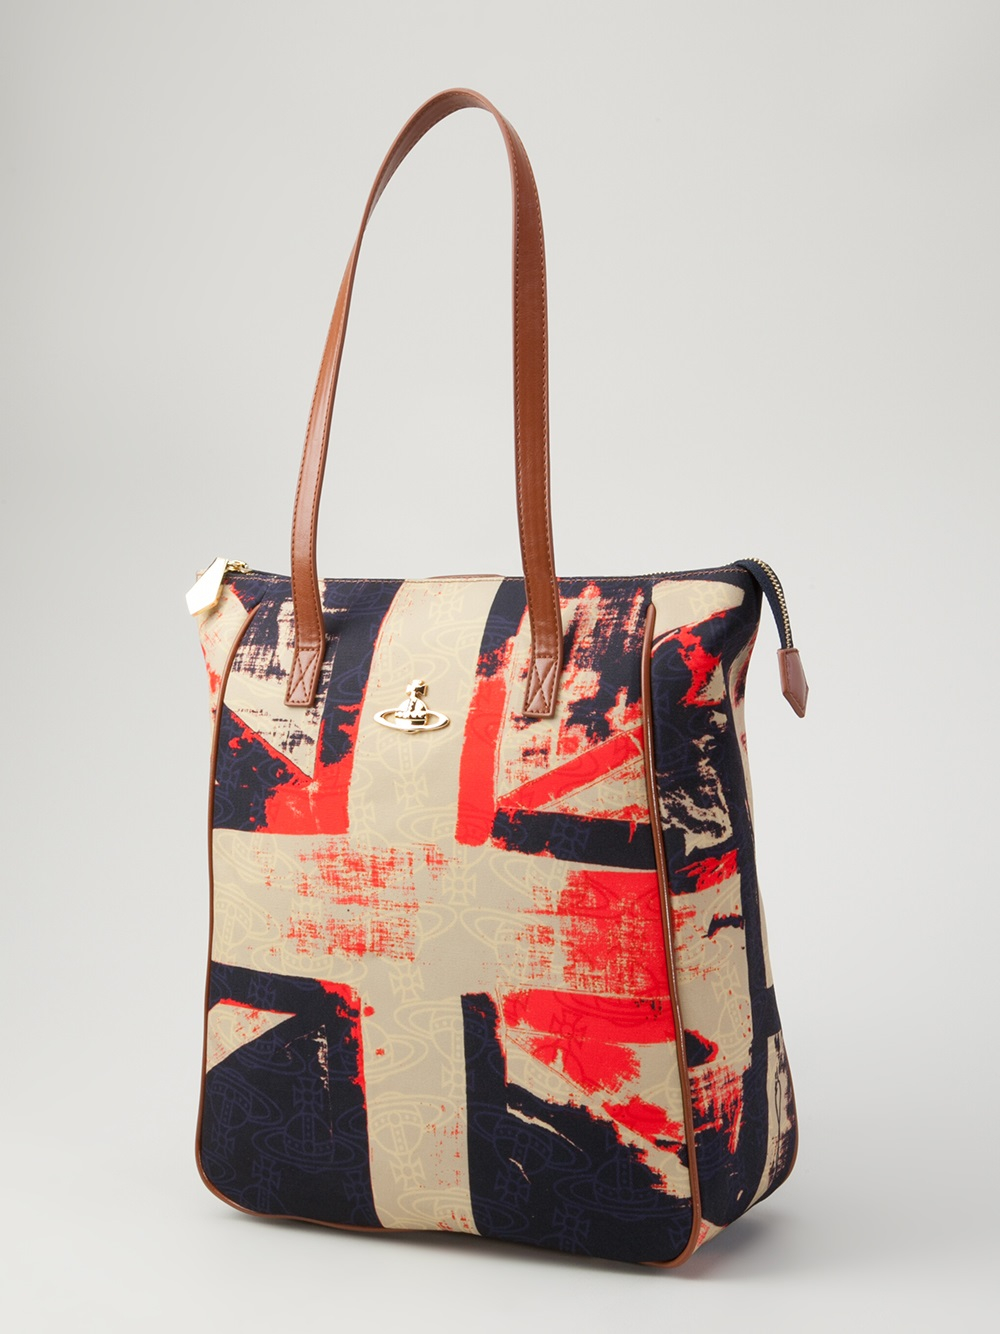 5a8bb0202fc447 Lyst - Vivienne Westwood Union Jack Backpack